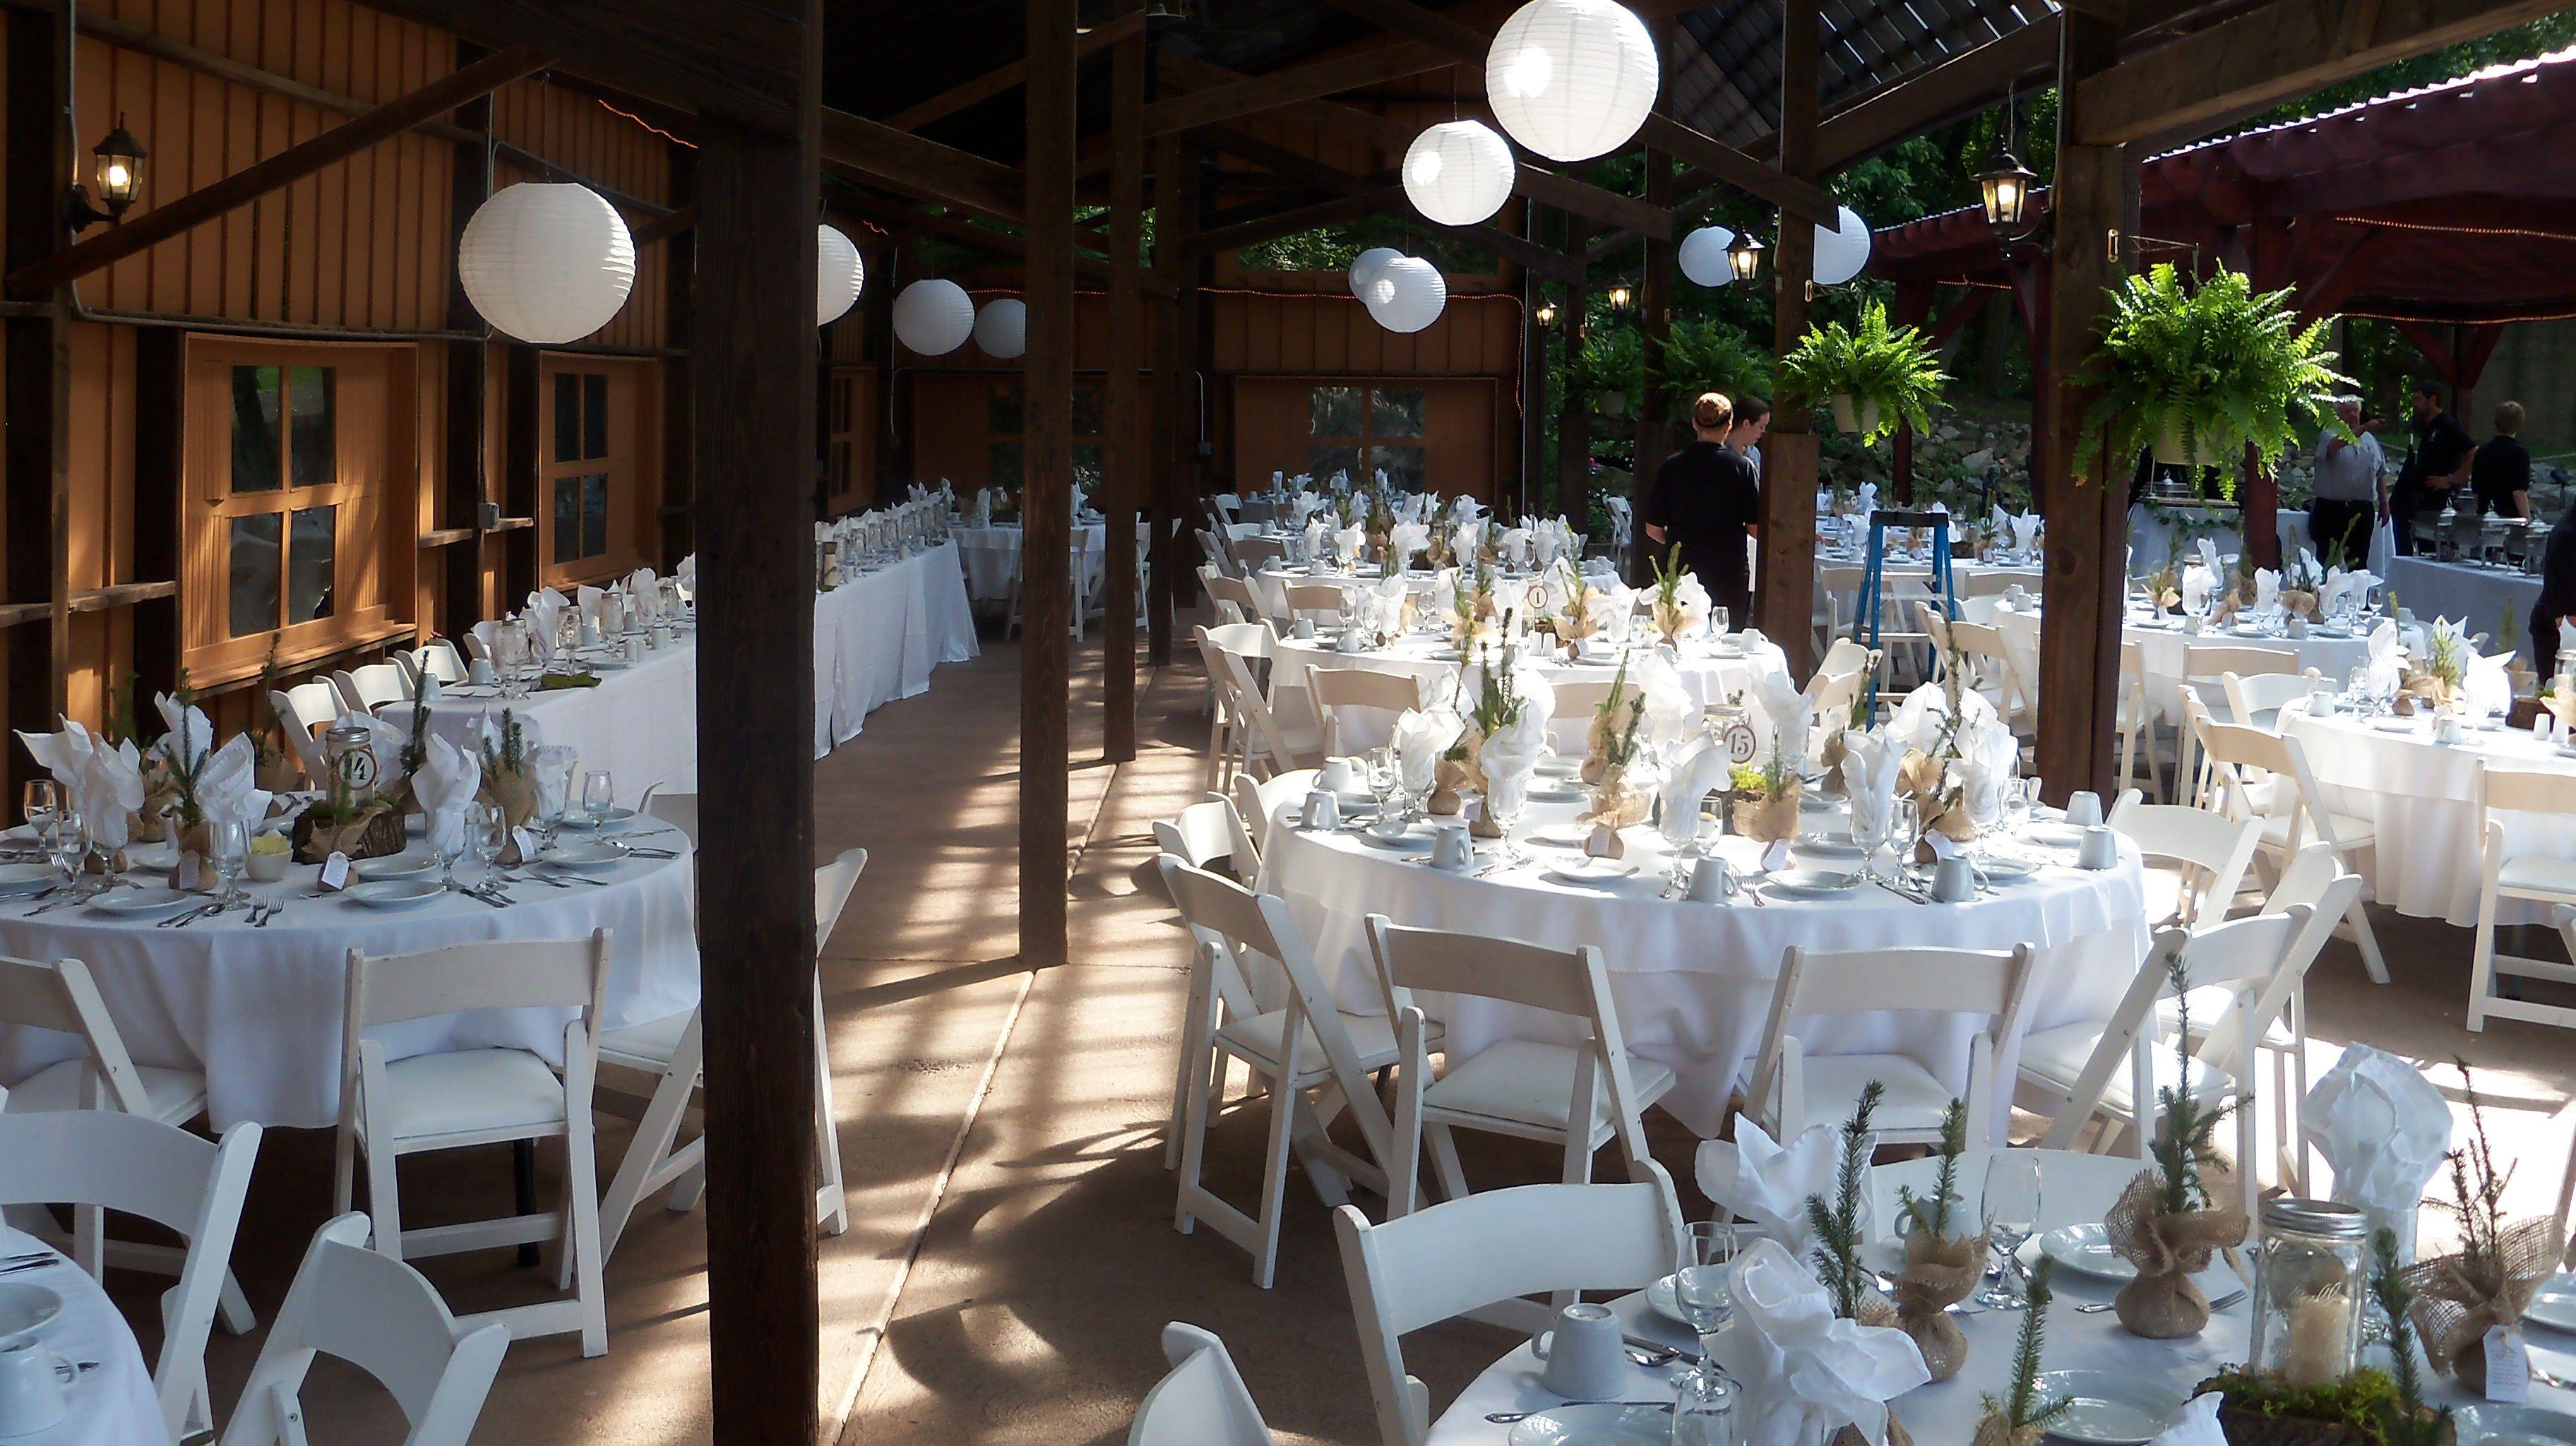 Niagara Falls Outdoor Wedding Setup At Lockport Canalside